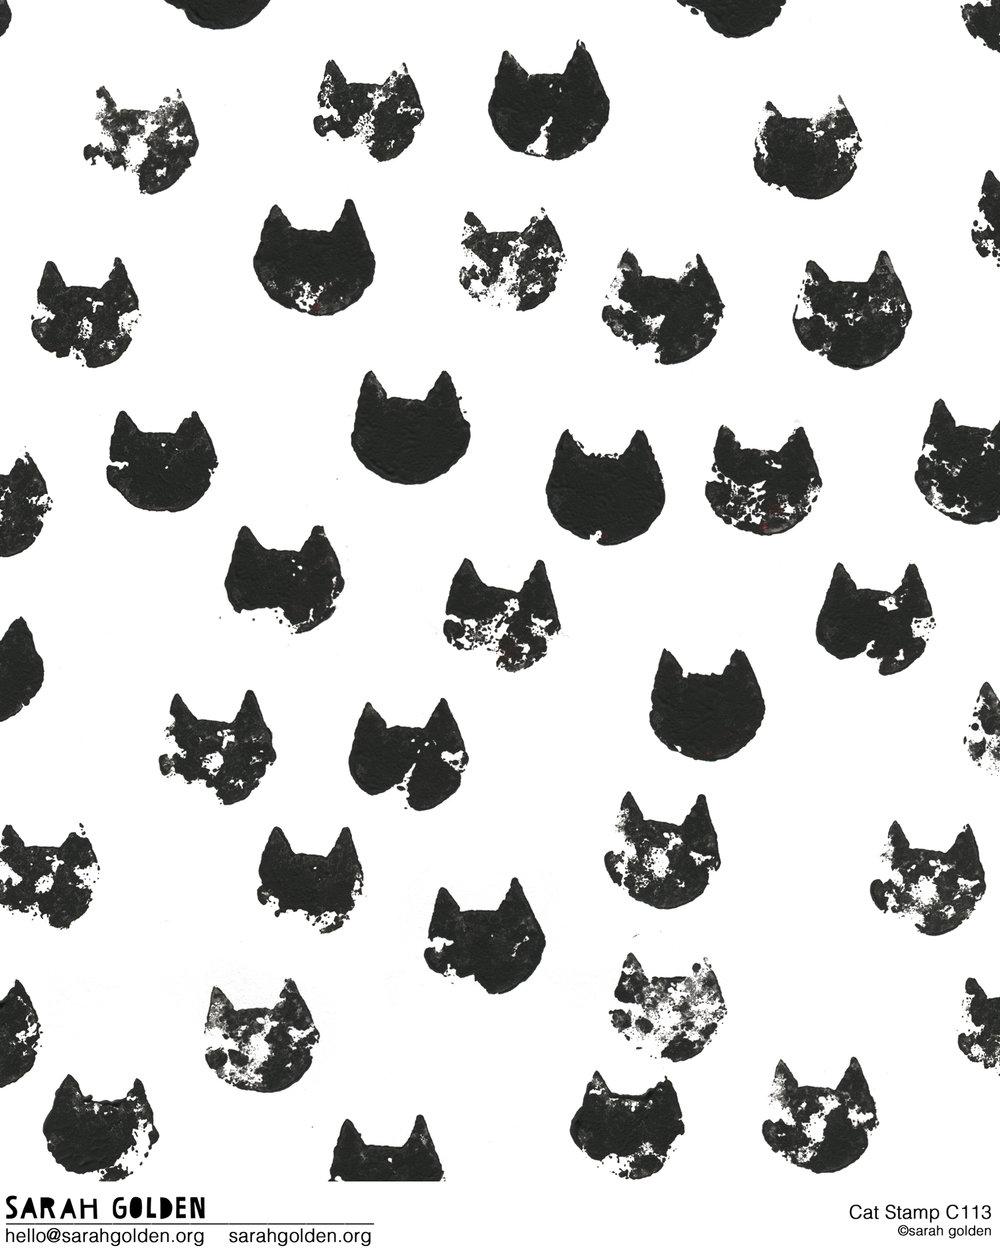 C113_Cat_Stamp_Catalog_Sarah_Golden_logo_web.jpg